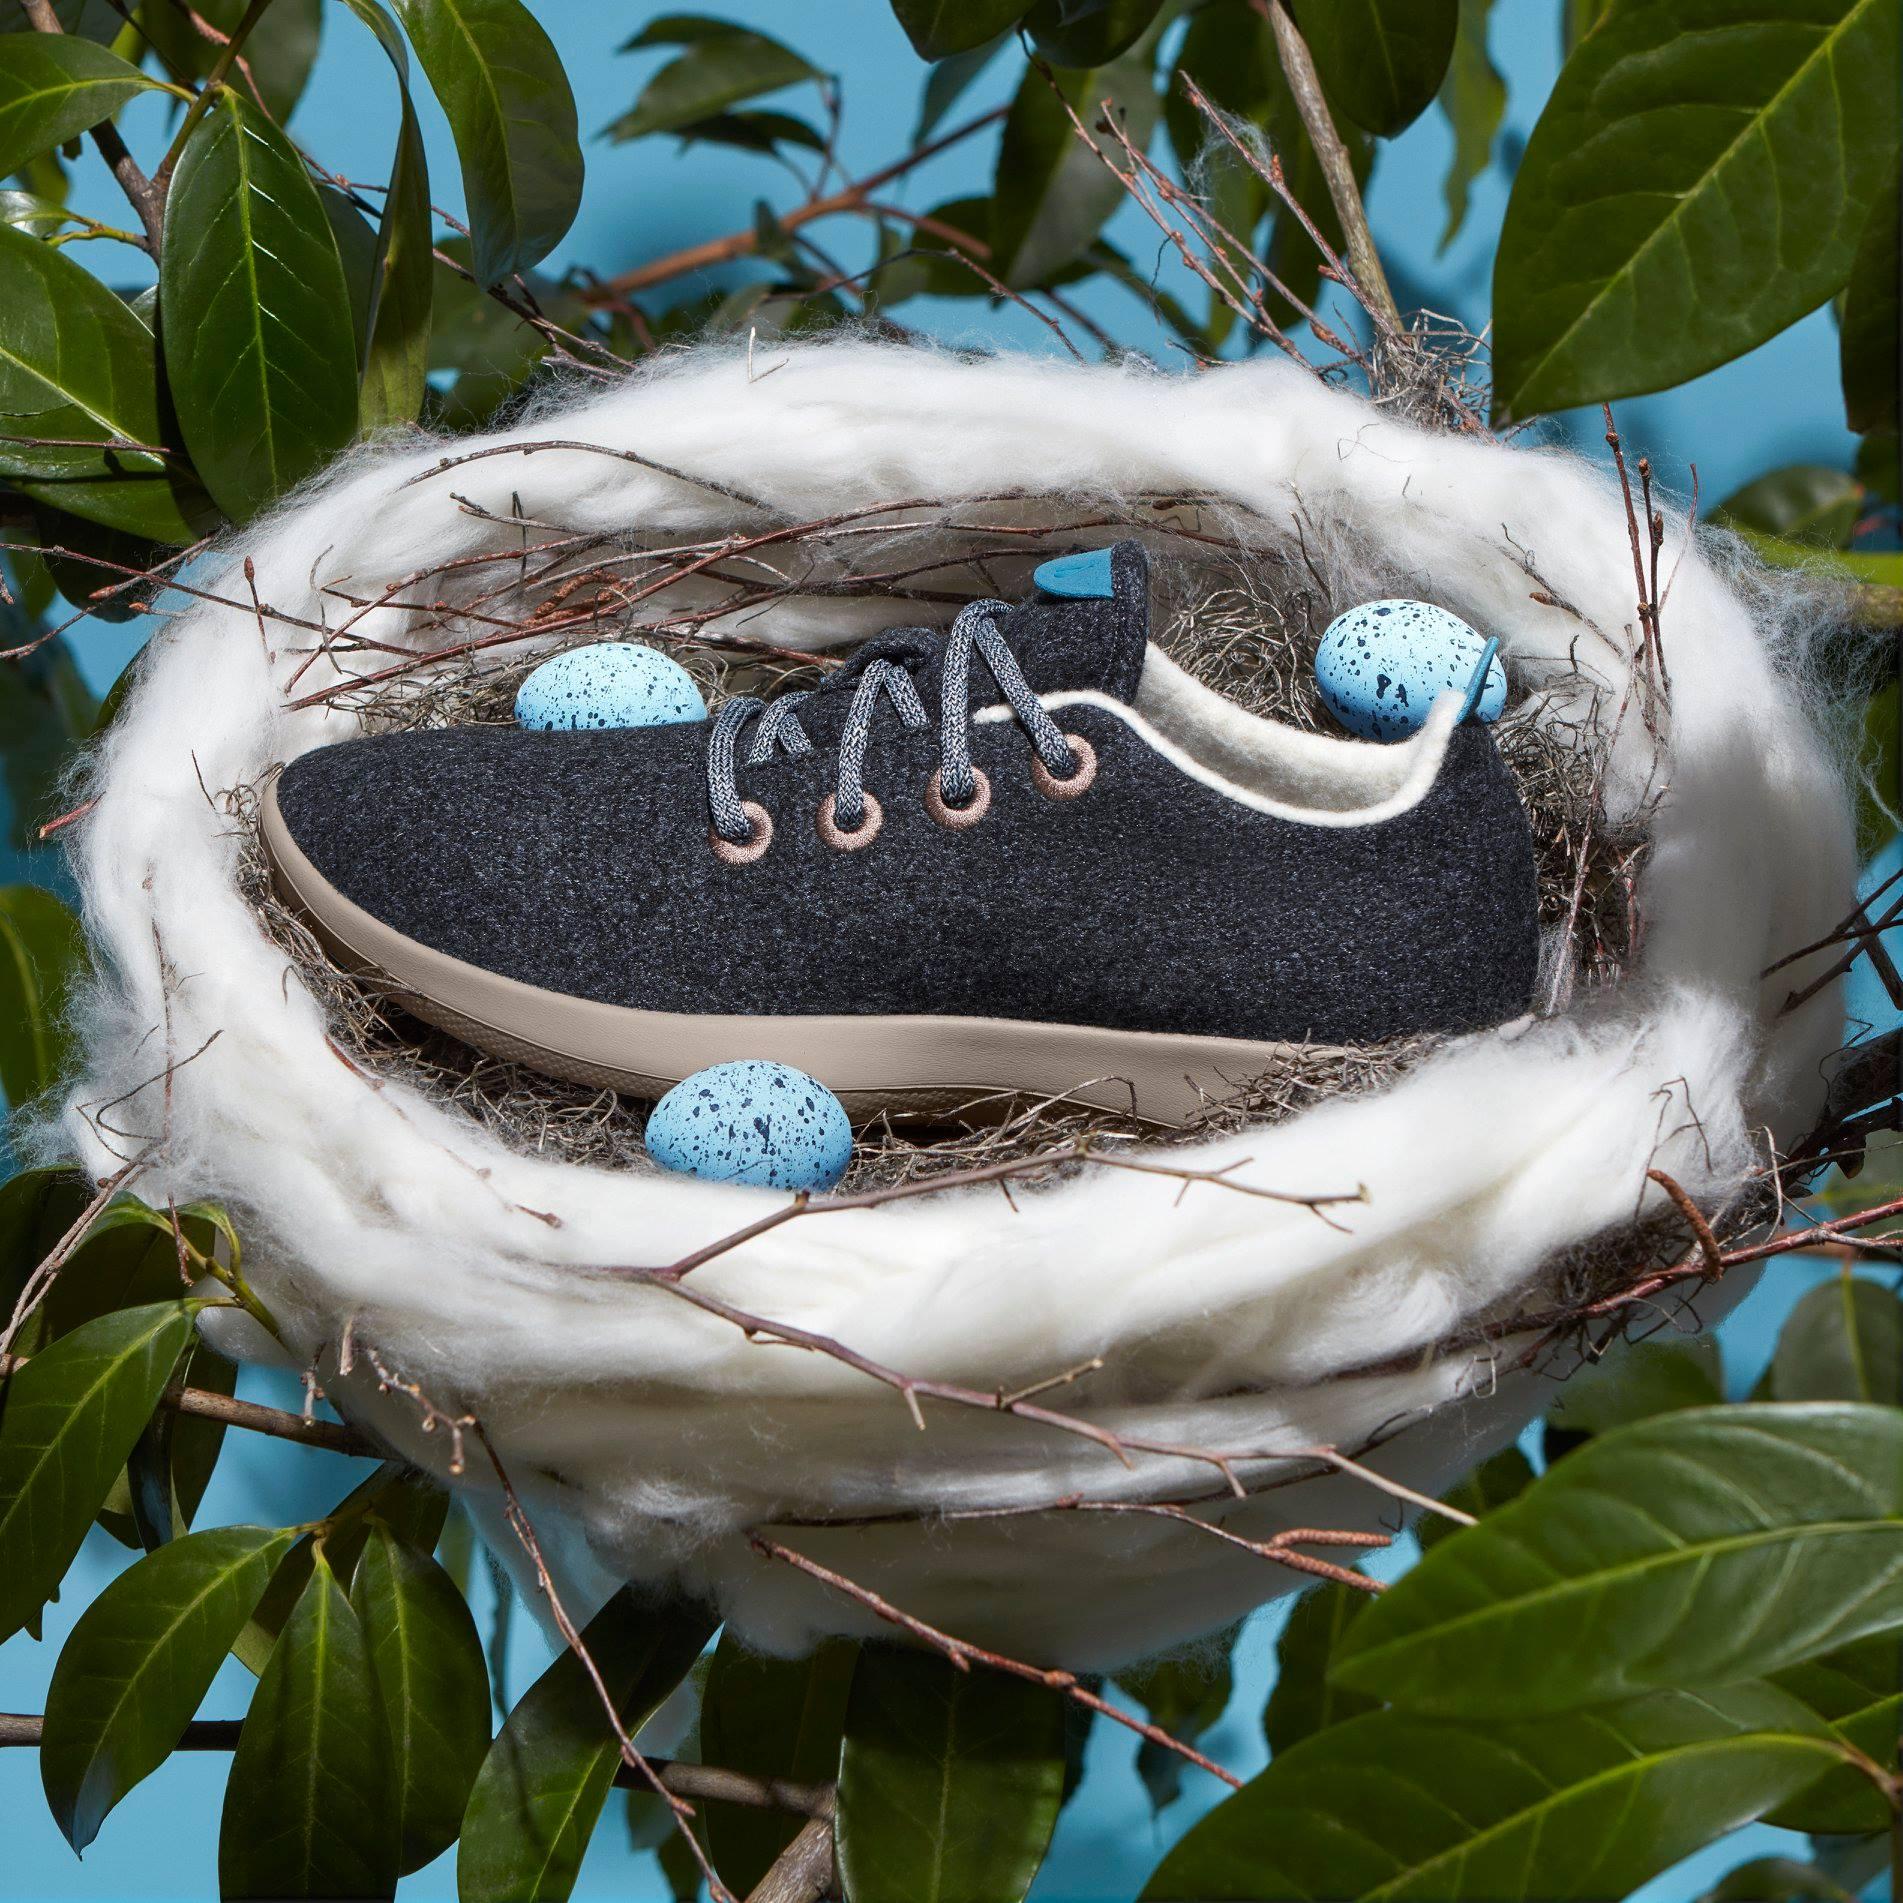 Allbirds 联合创始人 Joey Zwillinger:亚马逊「高仿」羊毛鞋,削弱其可持续发展成果